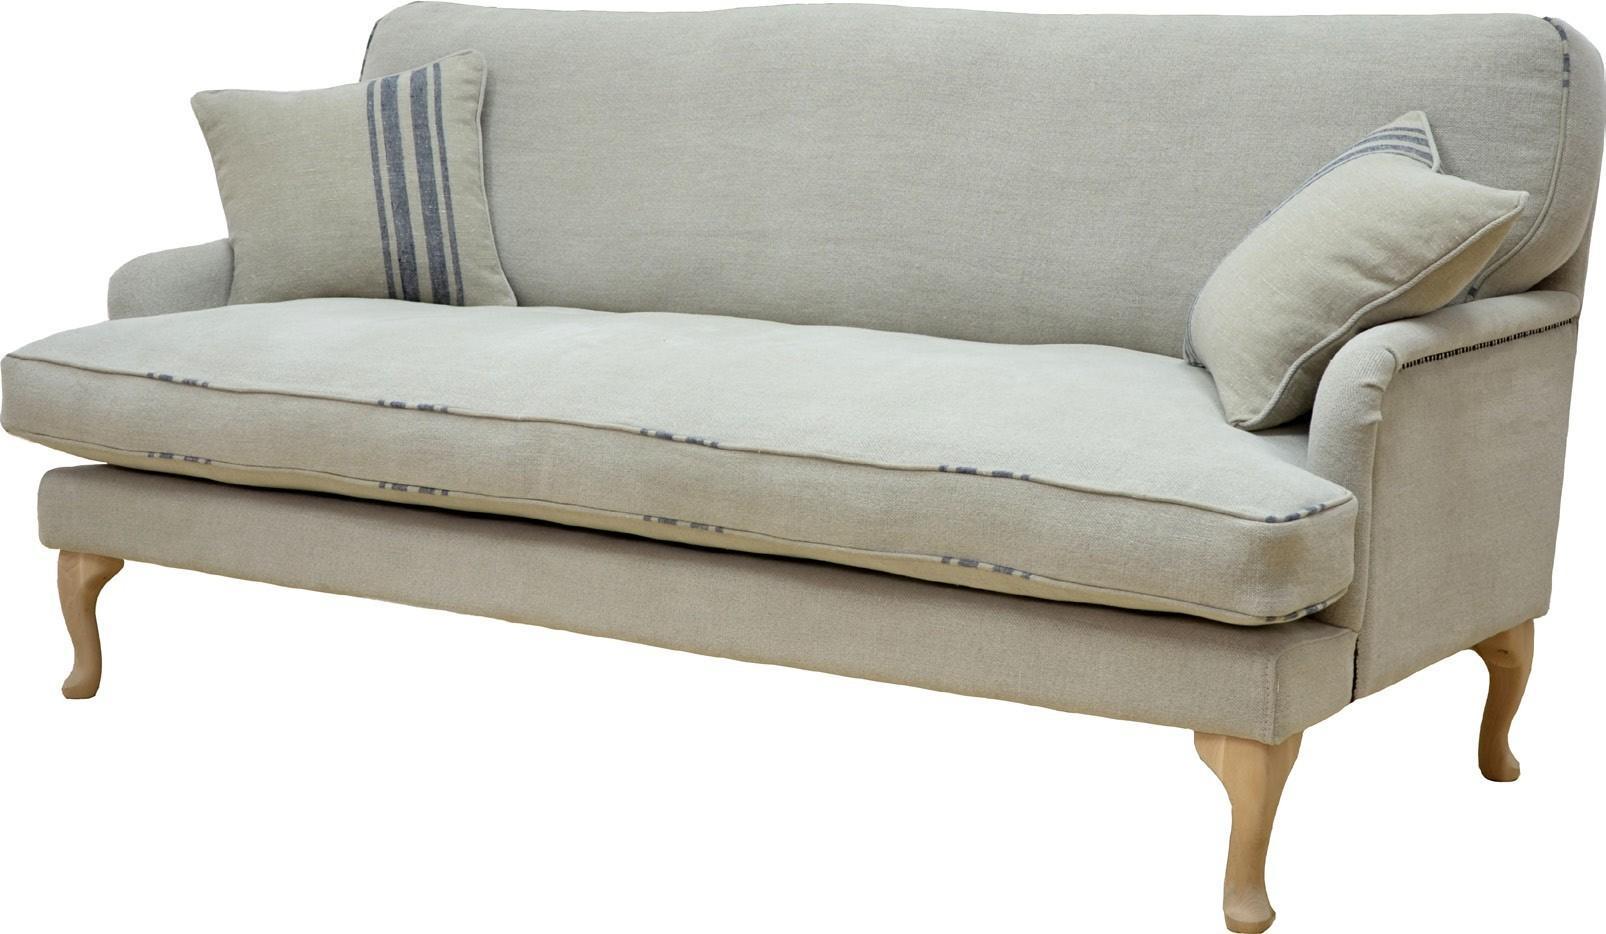 Sofa Mit Recamiere Landhausstil